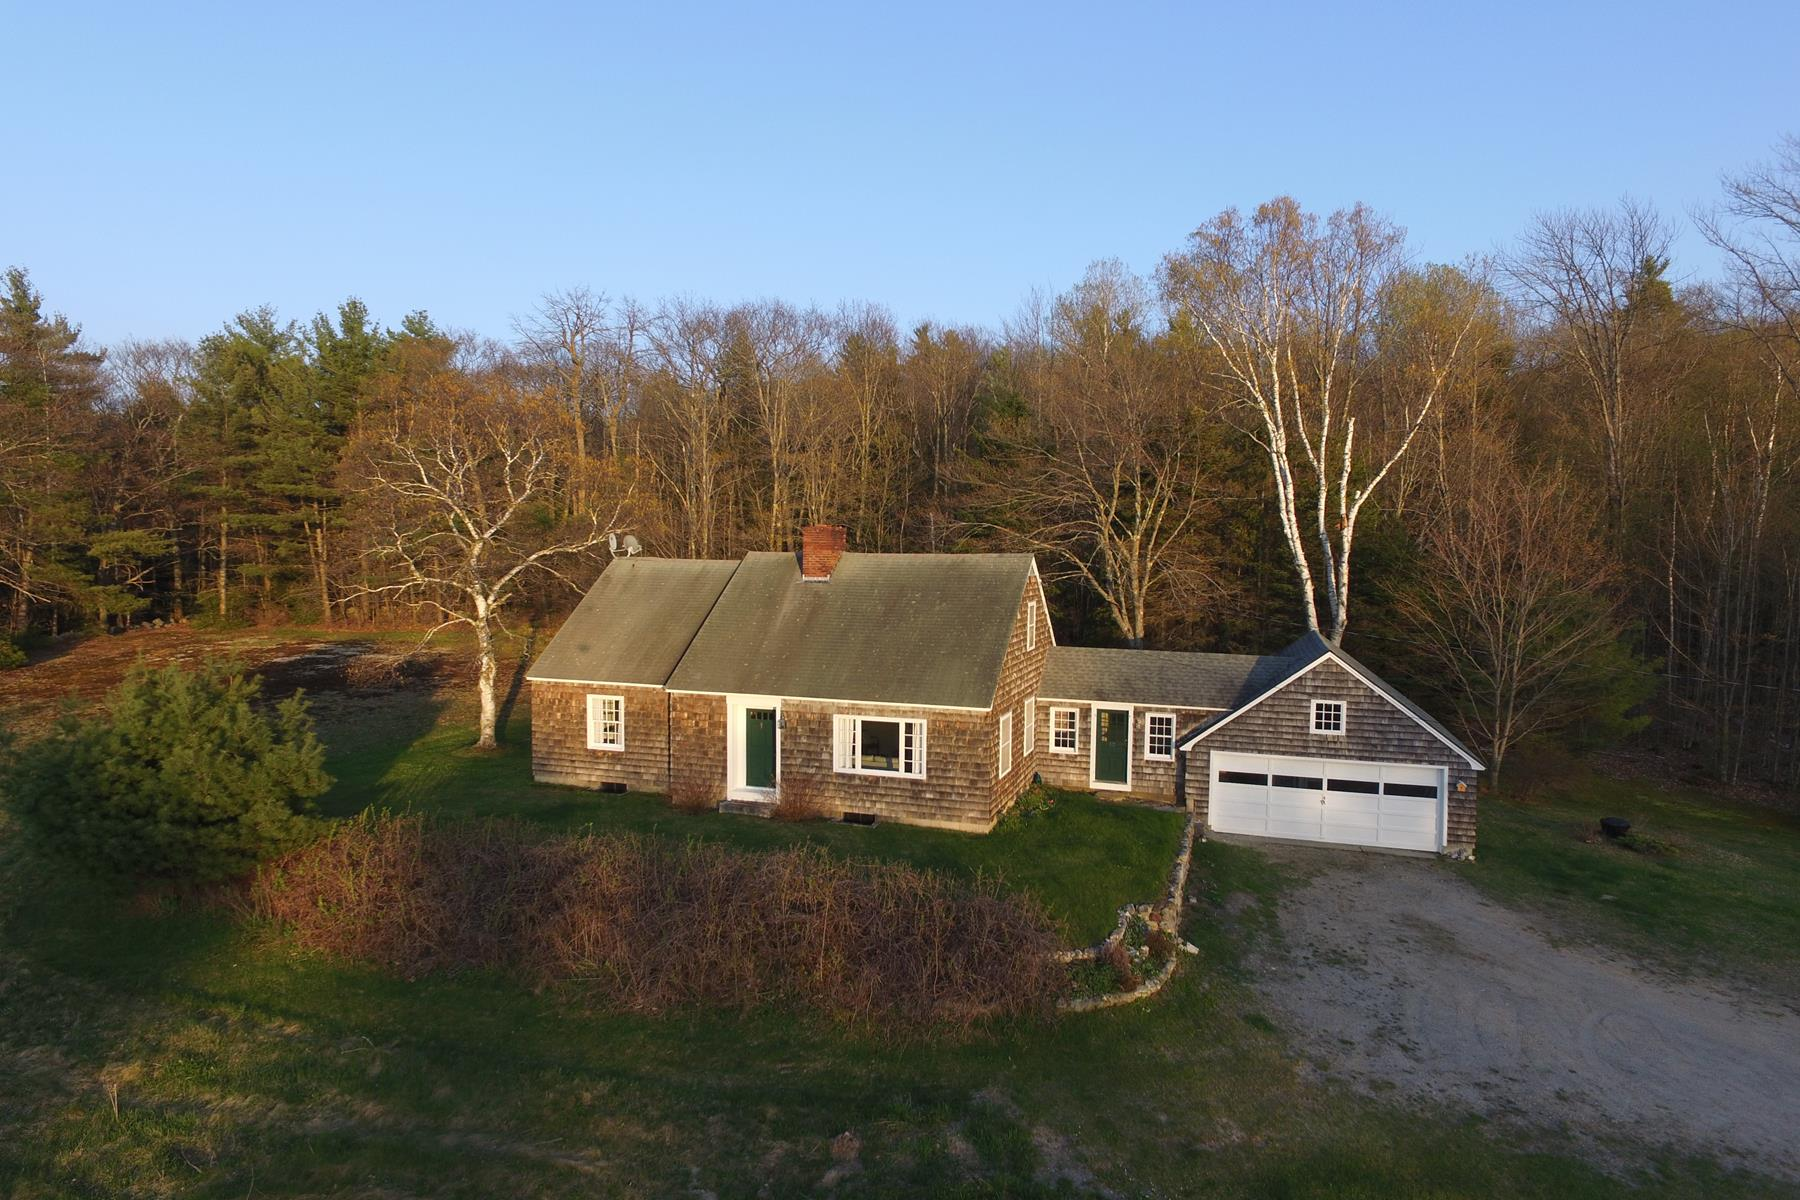 Single Family Home for Sale at 12 Johnson Farm, Newbury Newbury, New Hampshire, 03255 United States